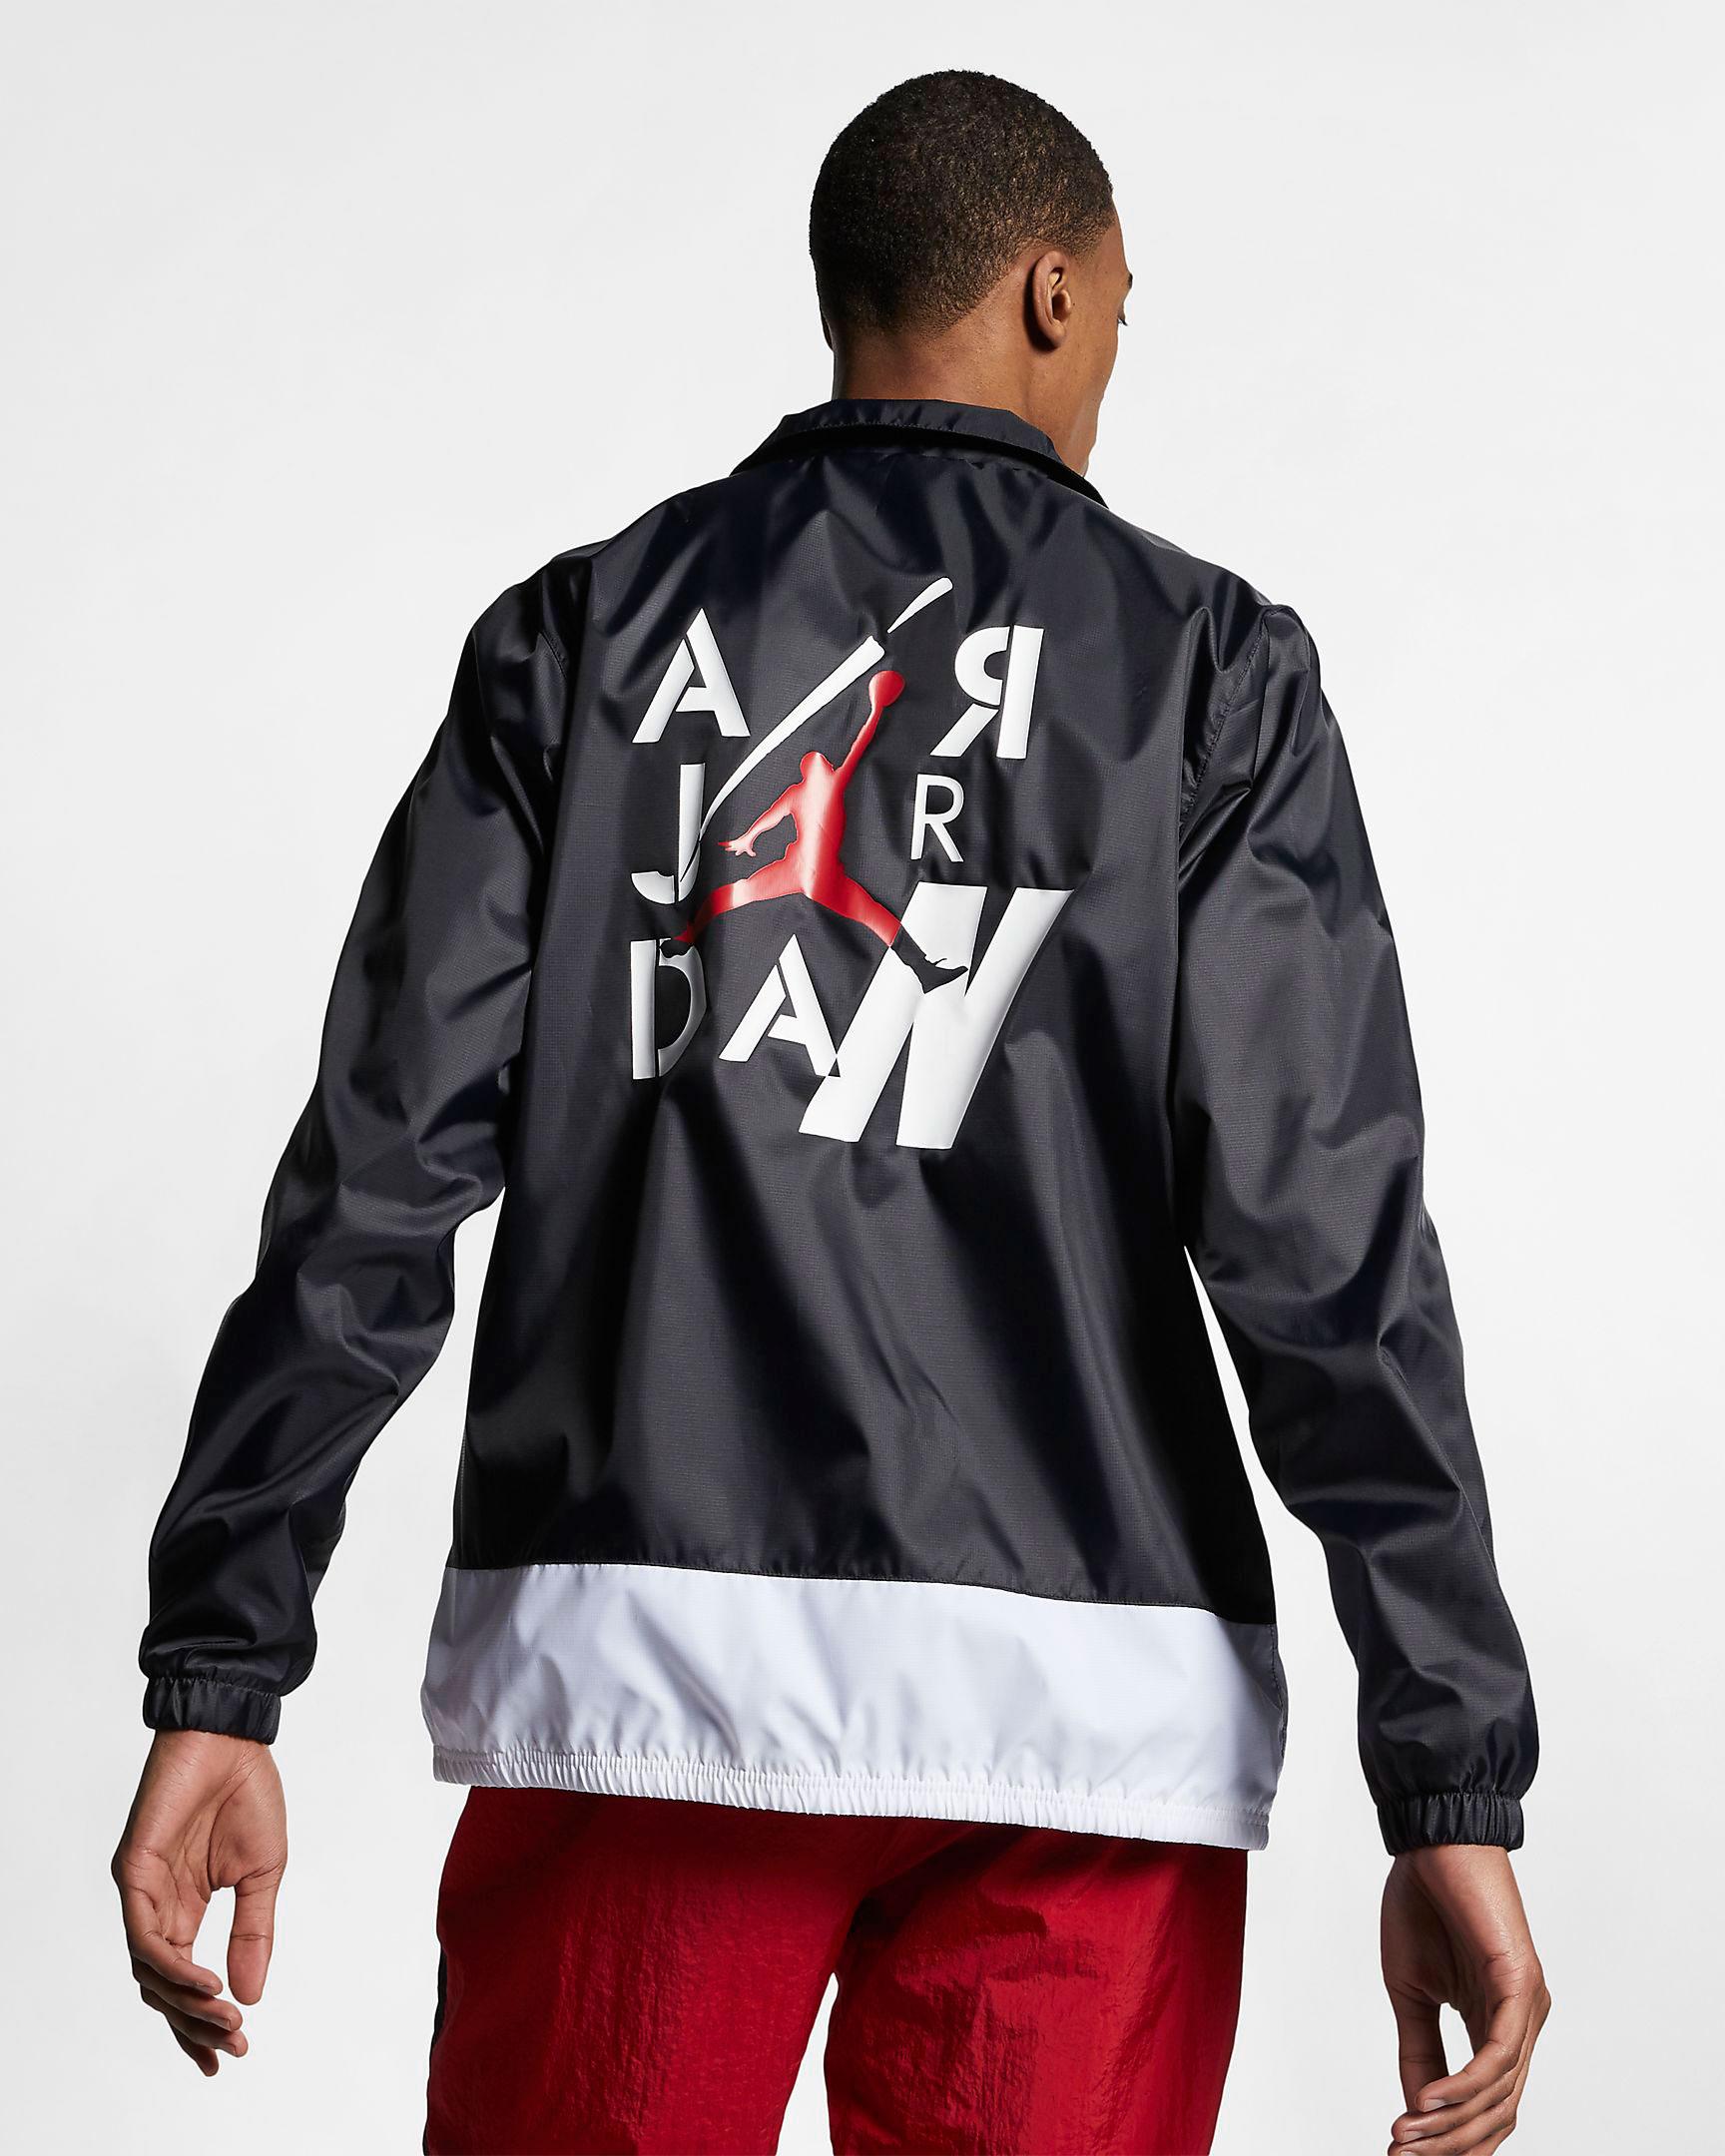 air-jordan-4-bred-2019-jacket-2